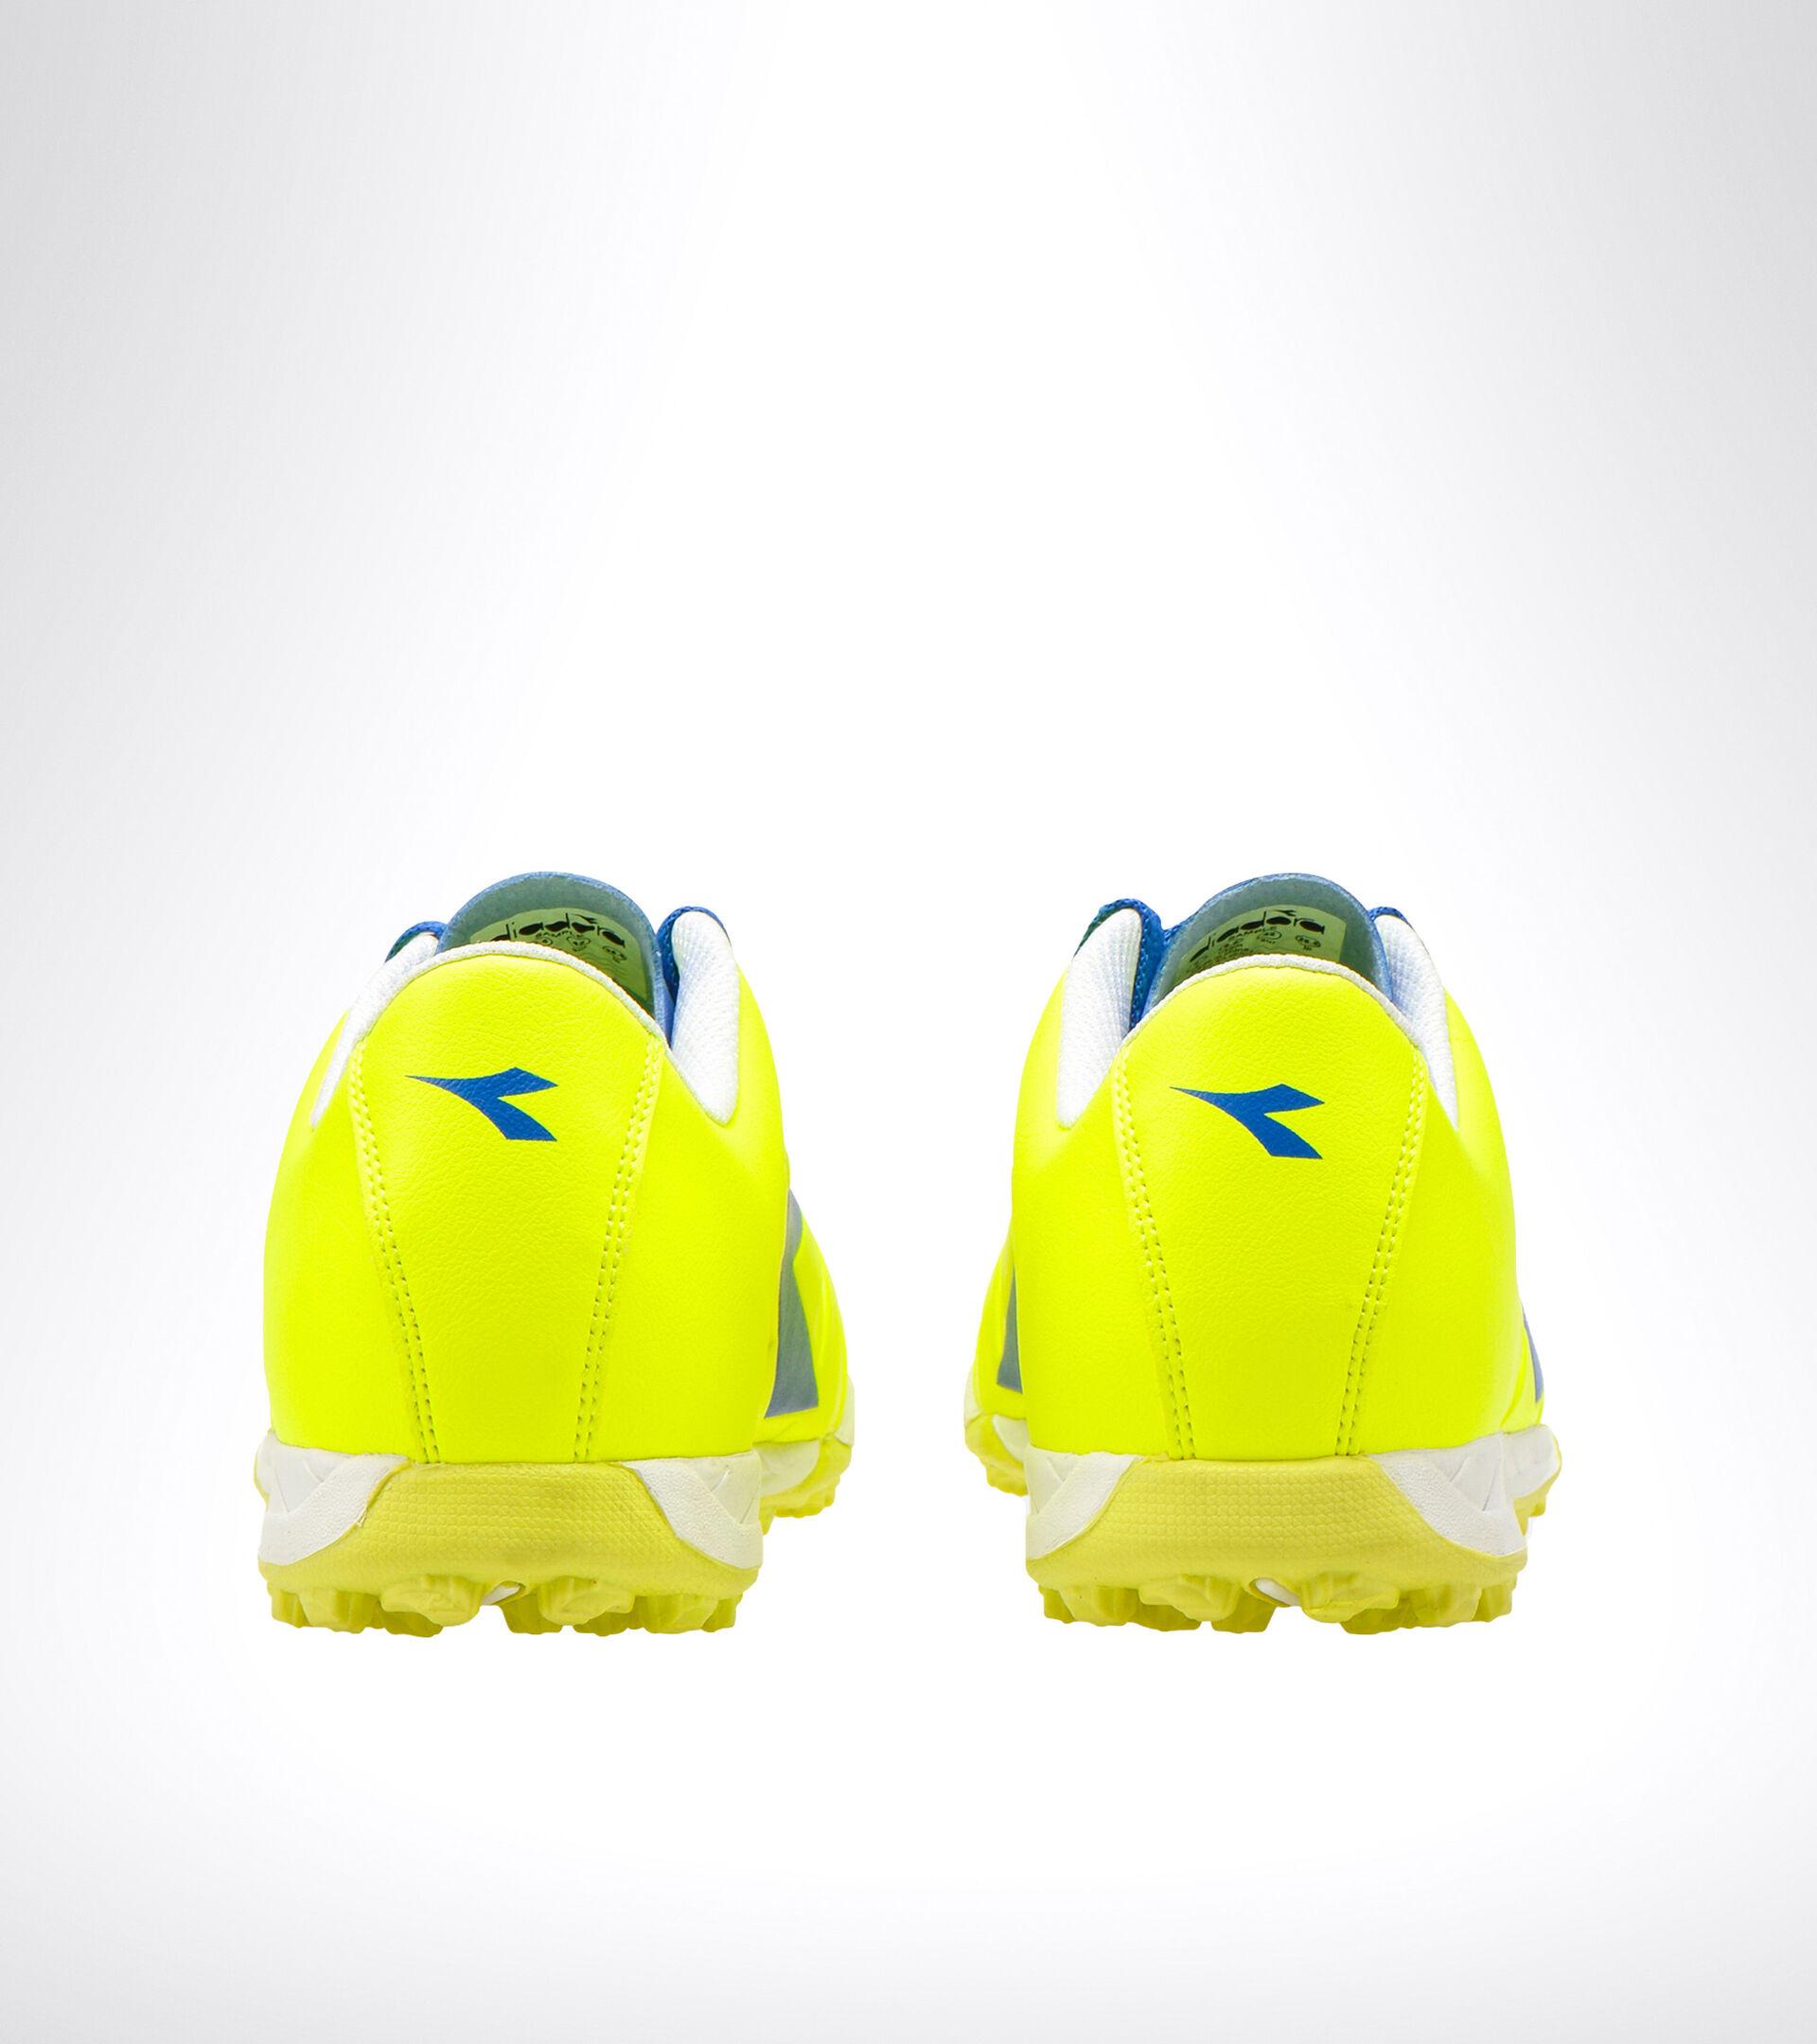 Footwear Sport UOMO PICHICHI 3 TF FLUO YELLOW/ROYAL Diadora